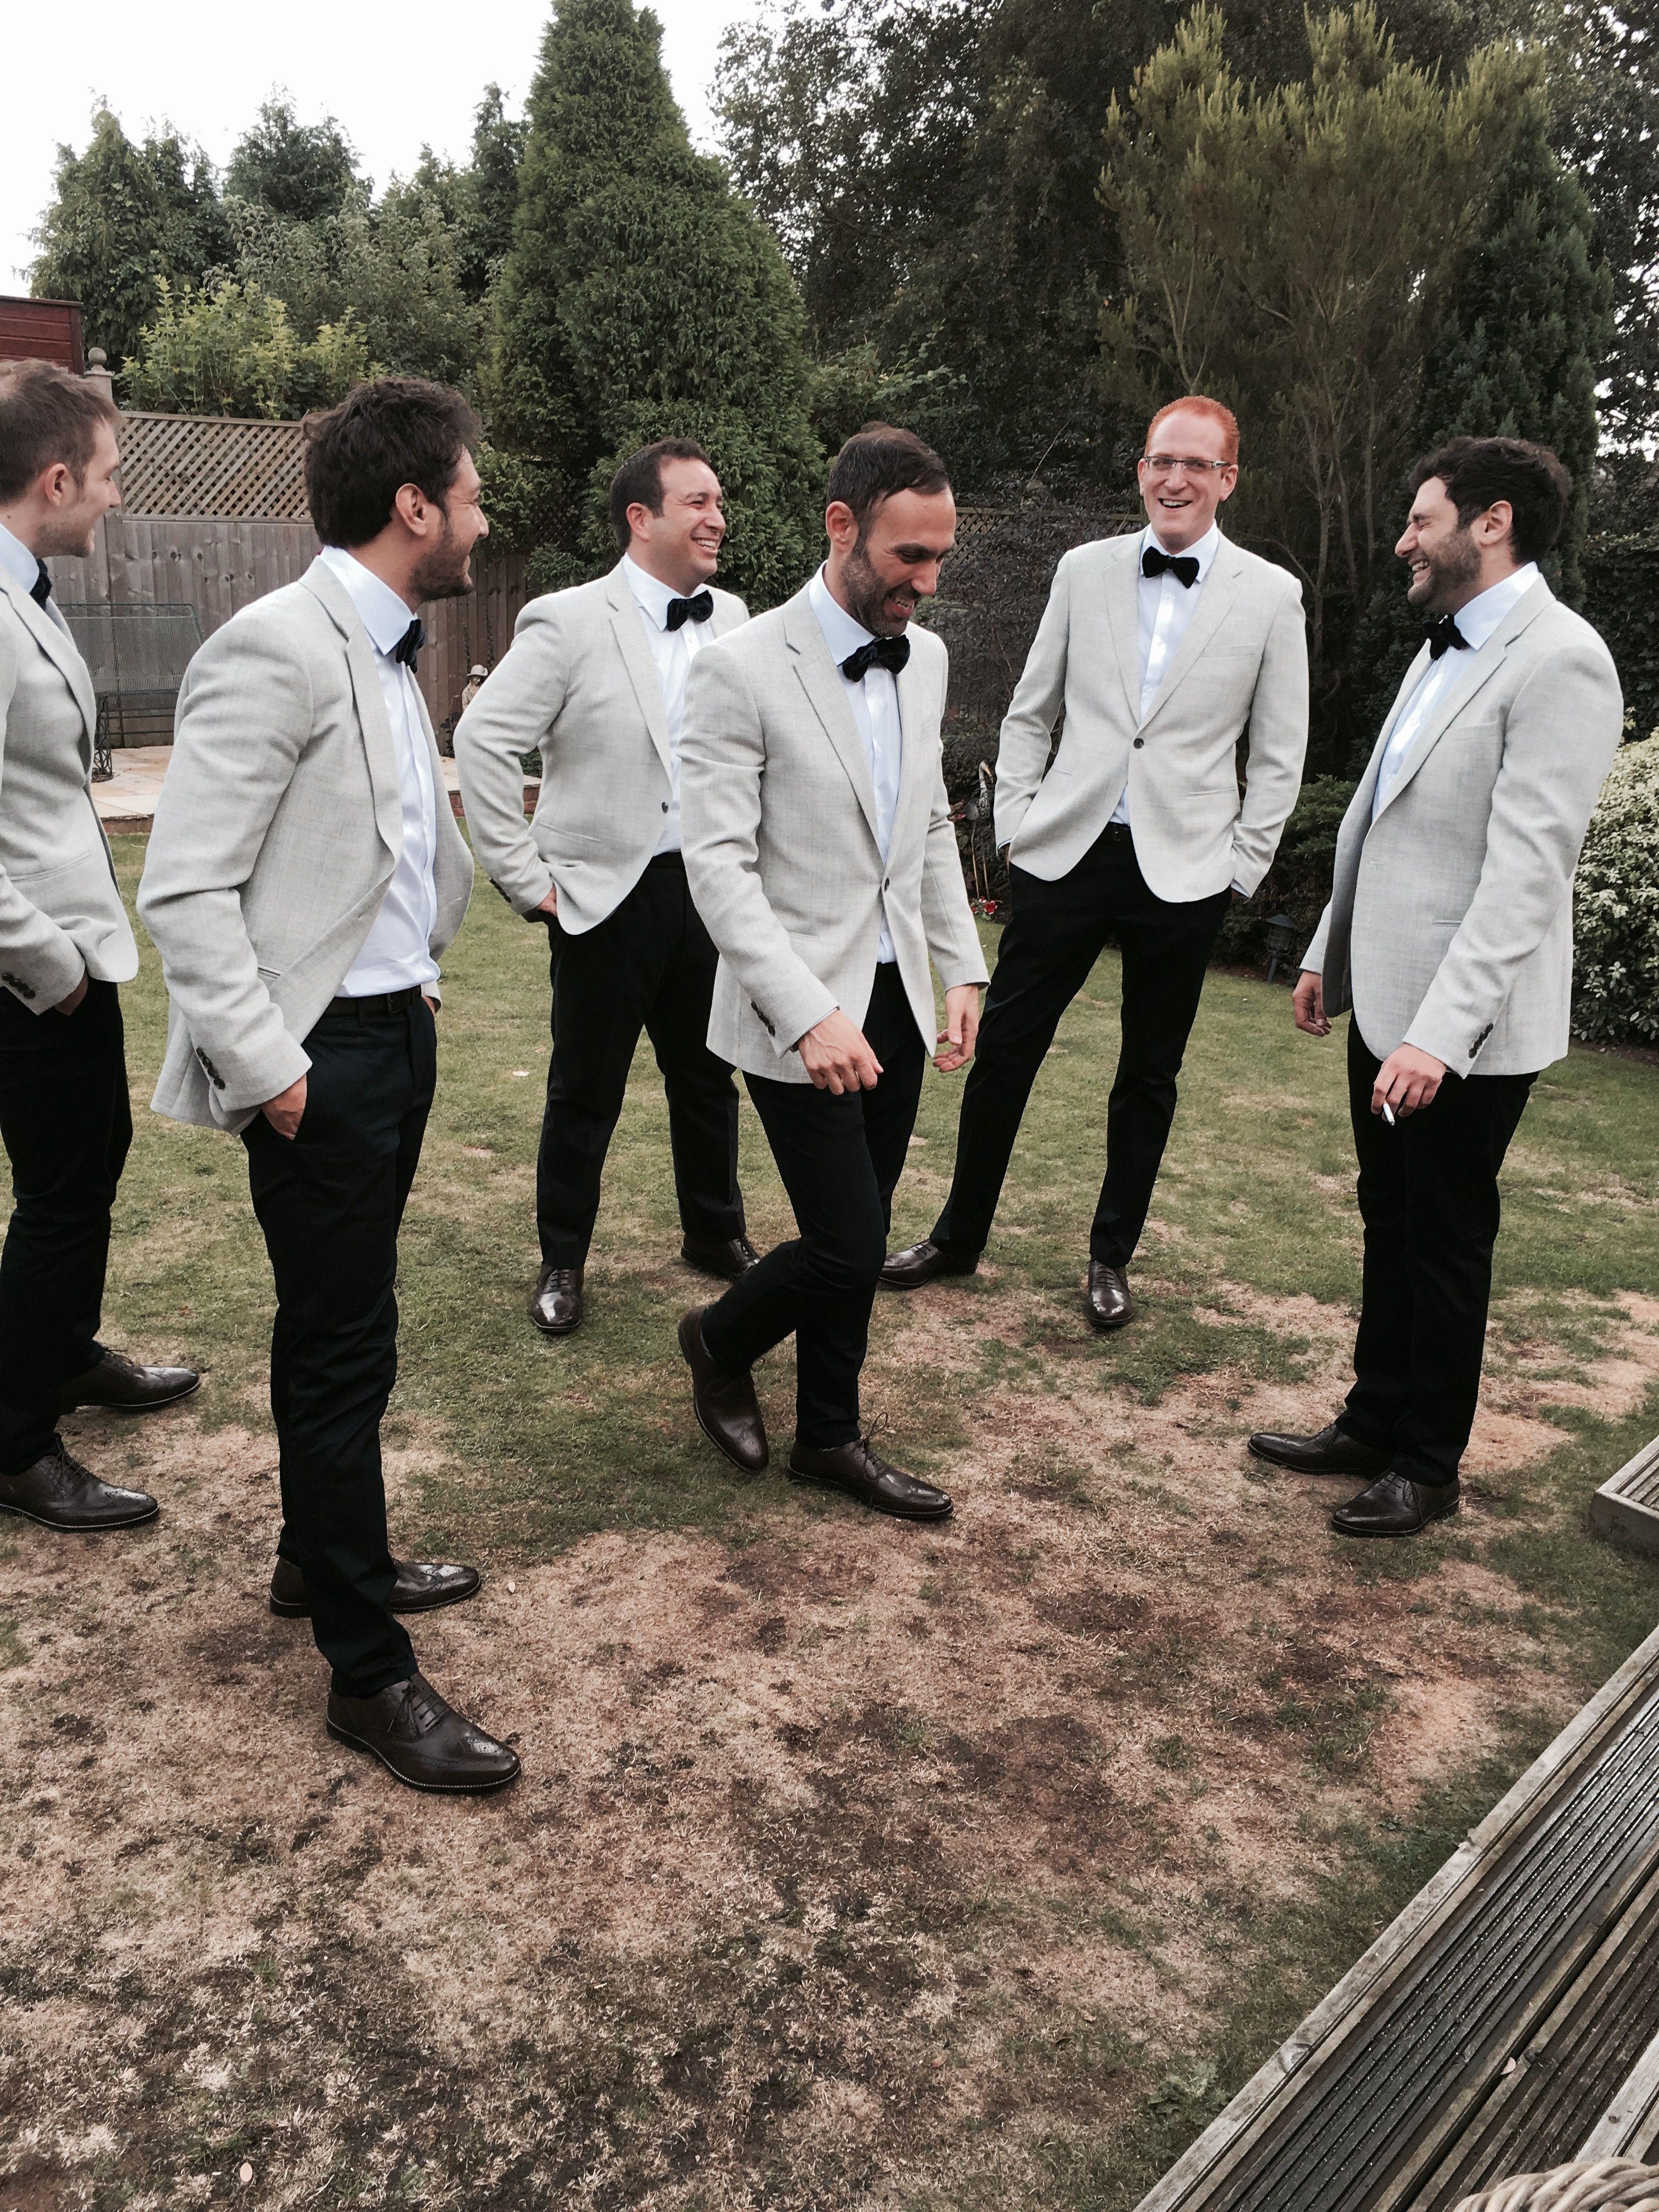 Groom Ushers Groomsmen Smart Dapper Bow Tie Wedding Chinos Usher Wedding Attire Wedding Groomsmen Attire Groom And Groomsmen Attire